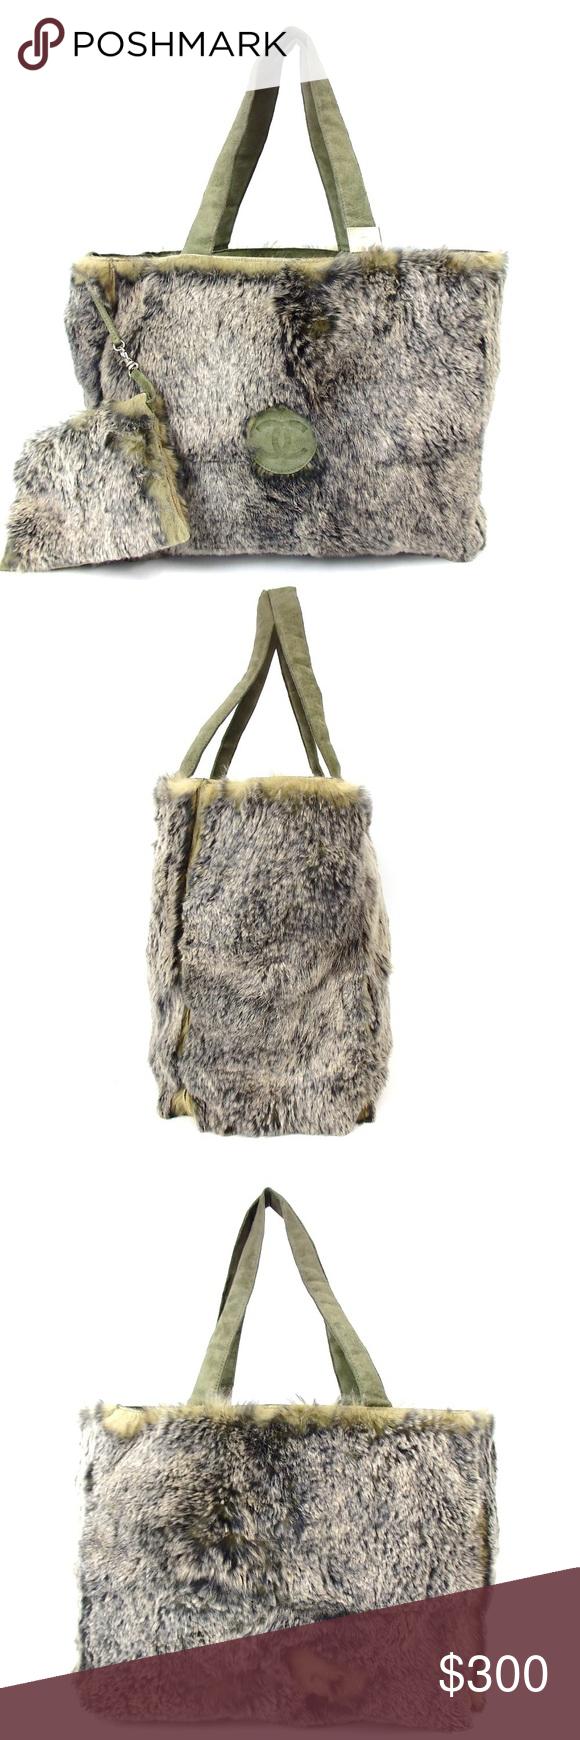 bdba3747ec0a Circa Chanel Lapin Rabbit Fur Tote Bag with Pouch A circa 2000 Chanel Lapin  rabbit fur tote with pouch. This dyed rabbit fur handbag features a green  suede ...